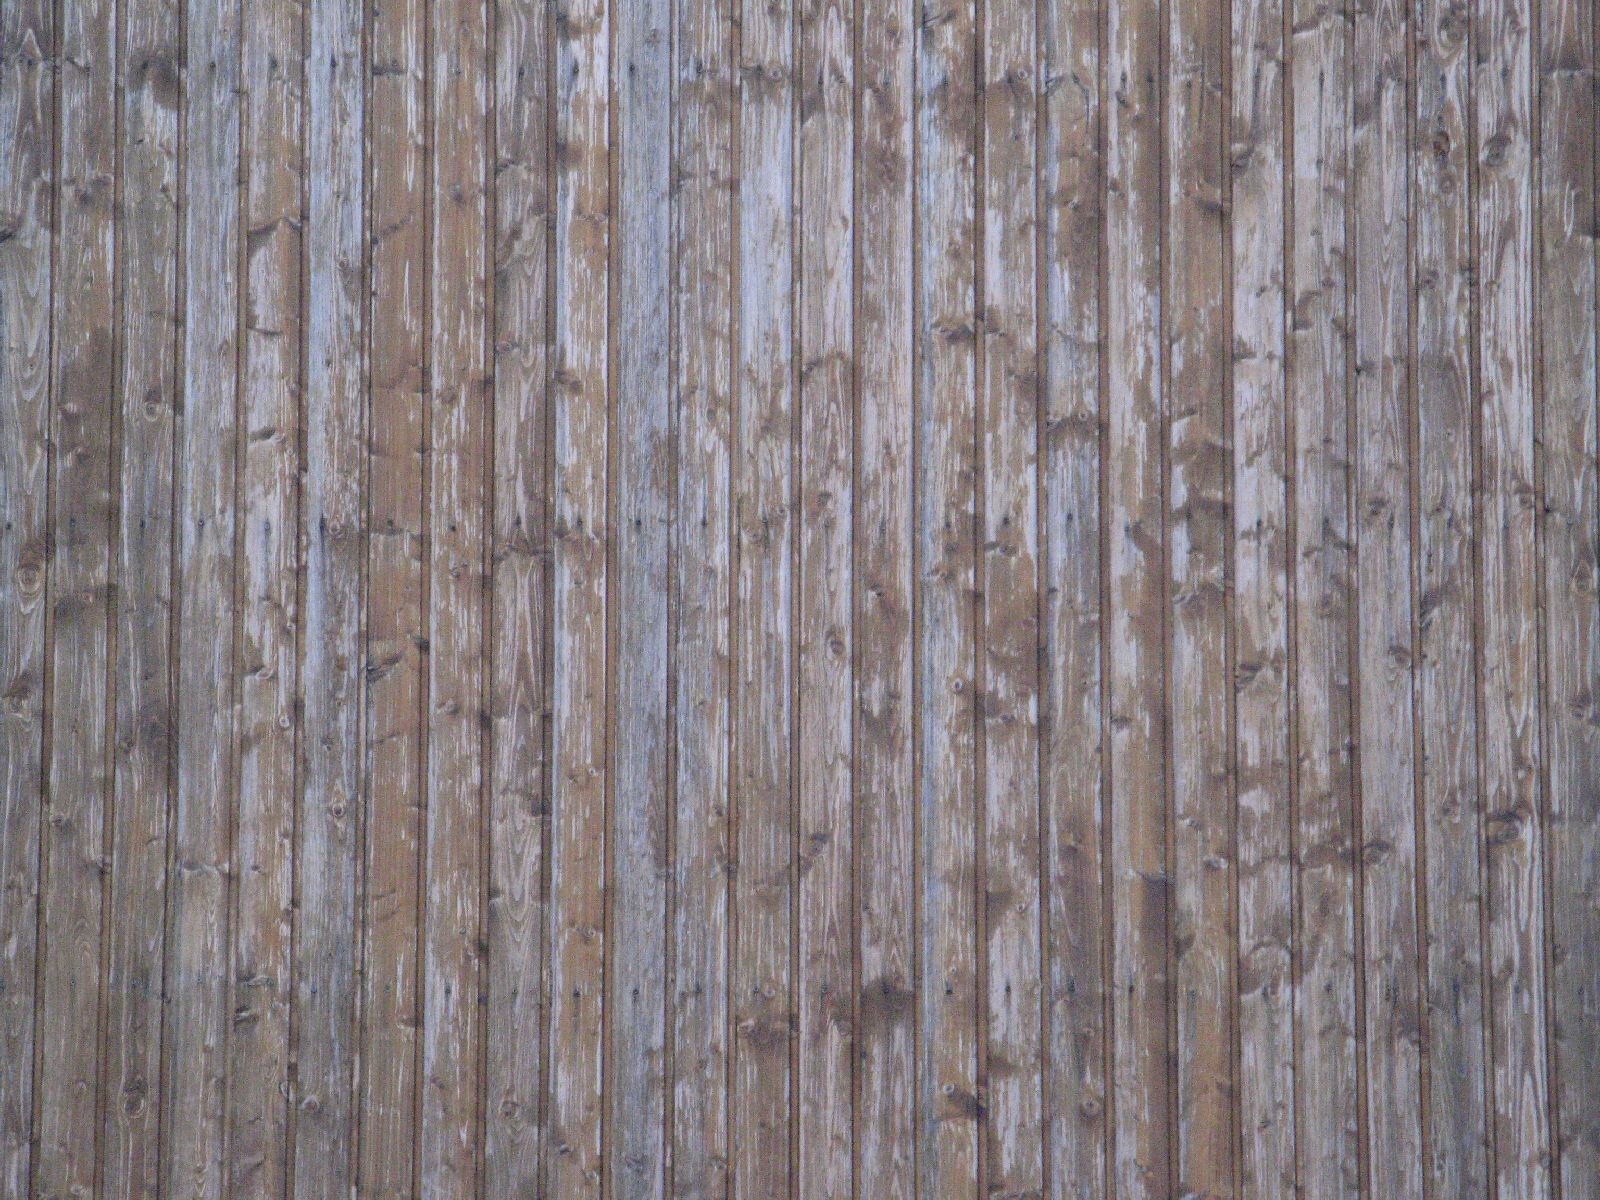 Wood_Textures_B_5627